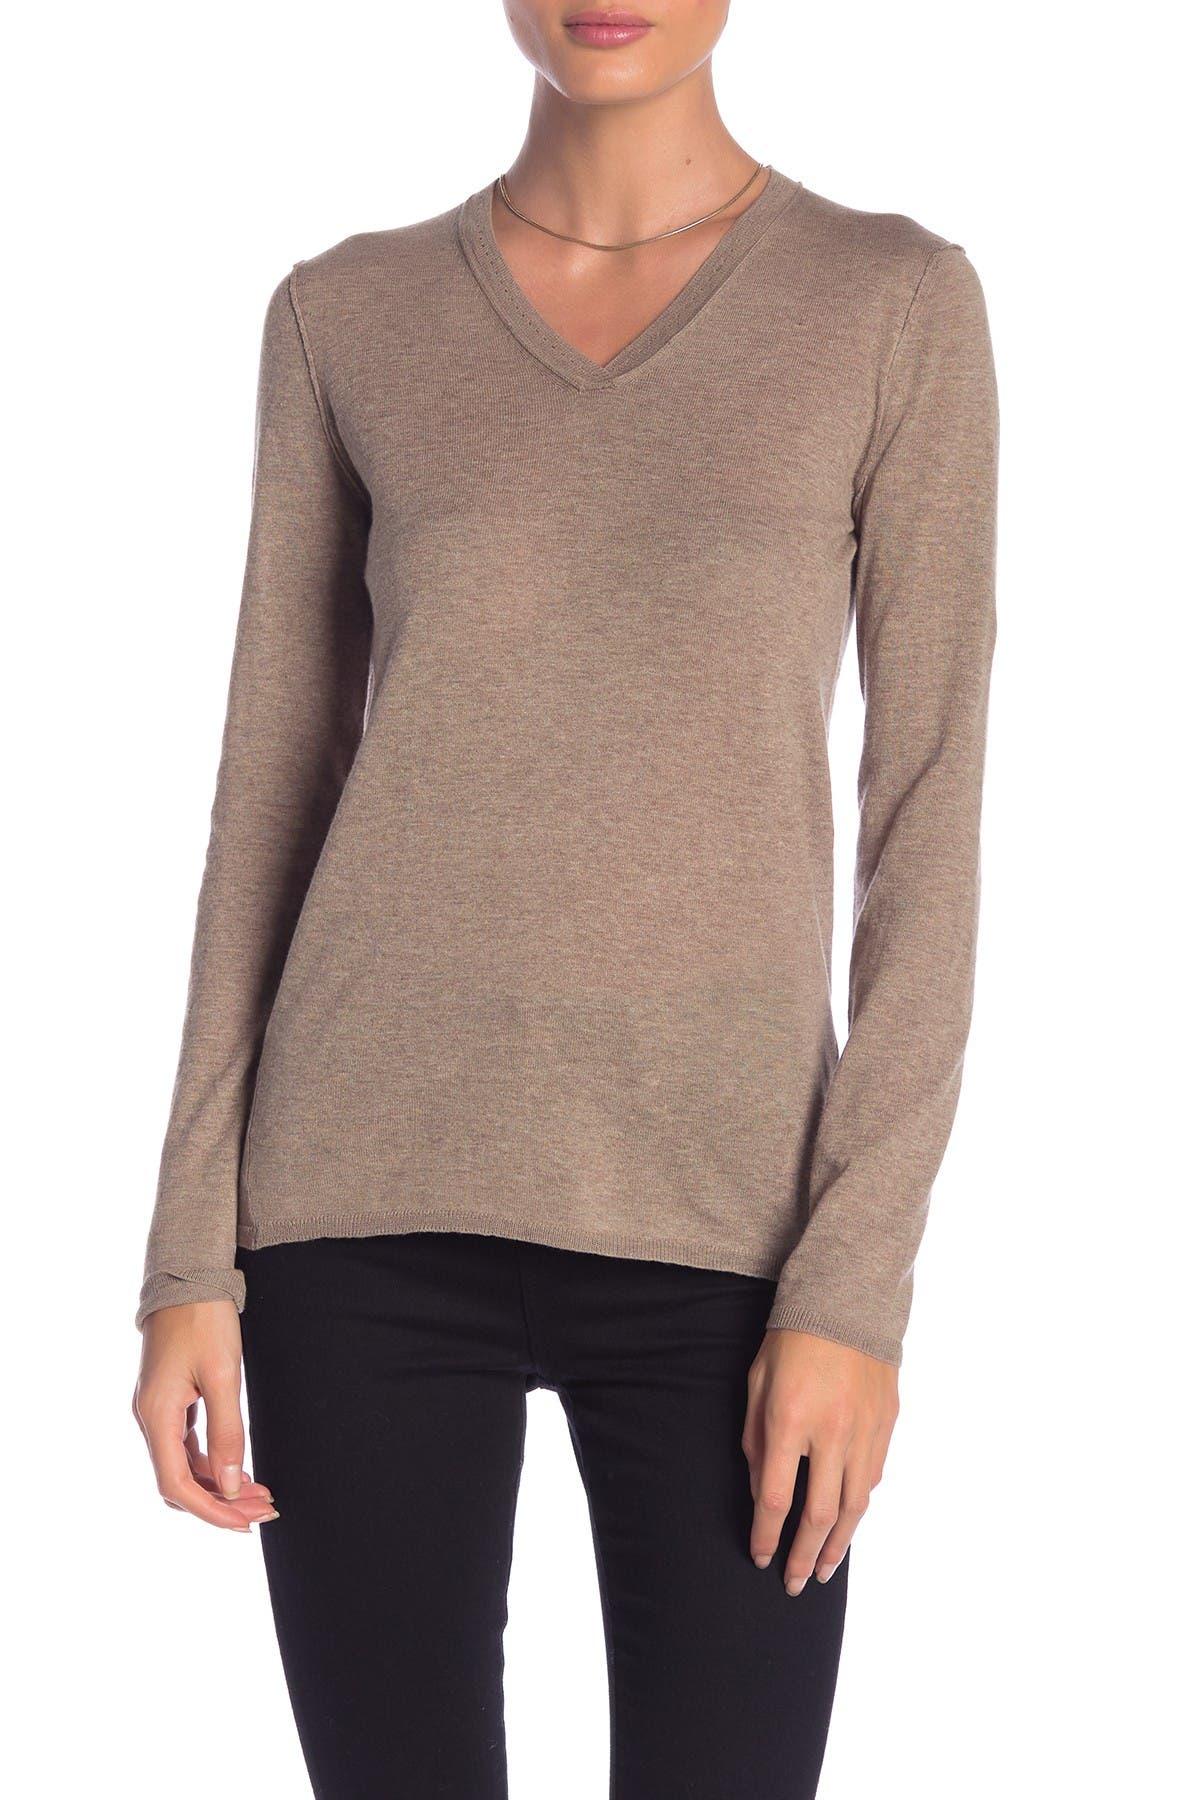 Image of Inhabit Essential Cotton V-Neck Sweater